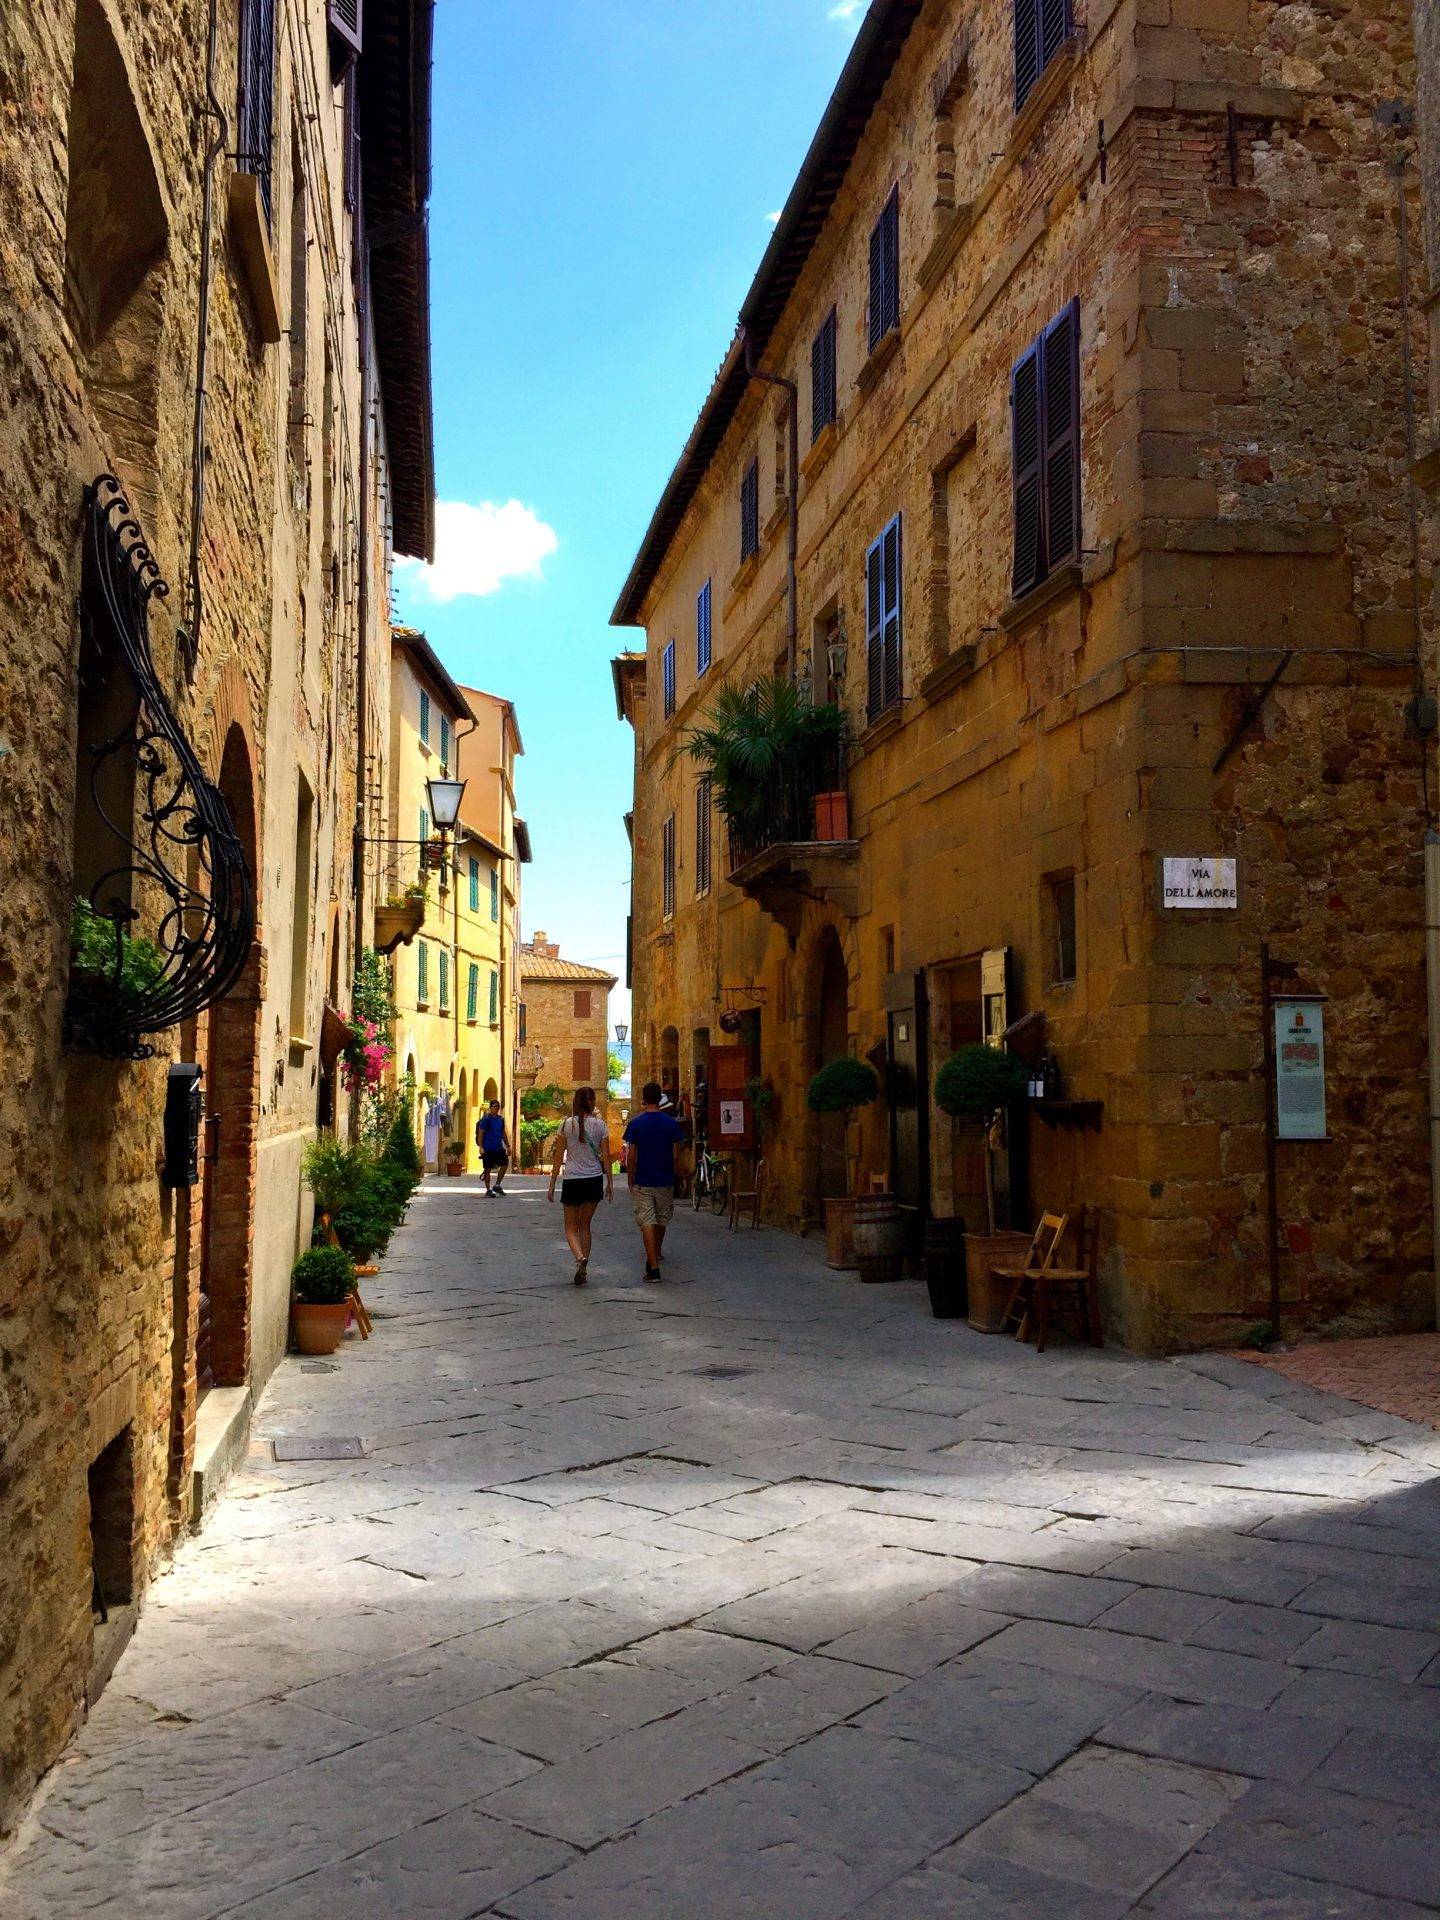 Walking around in Pienza Tuscany.